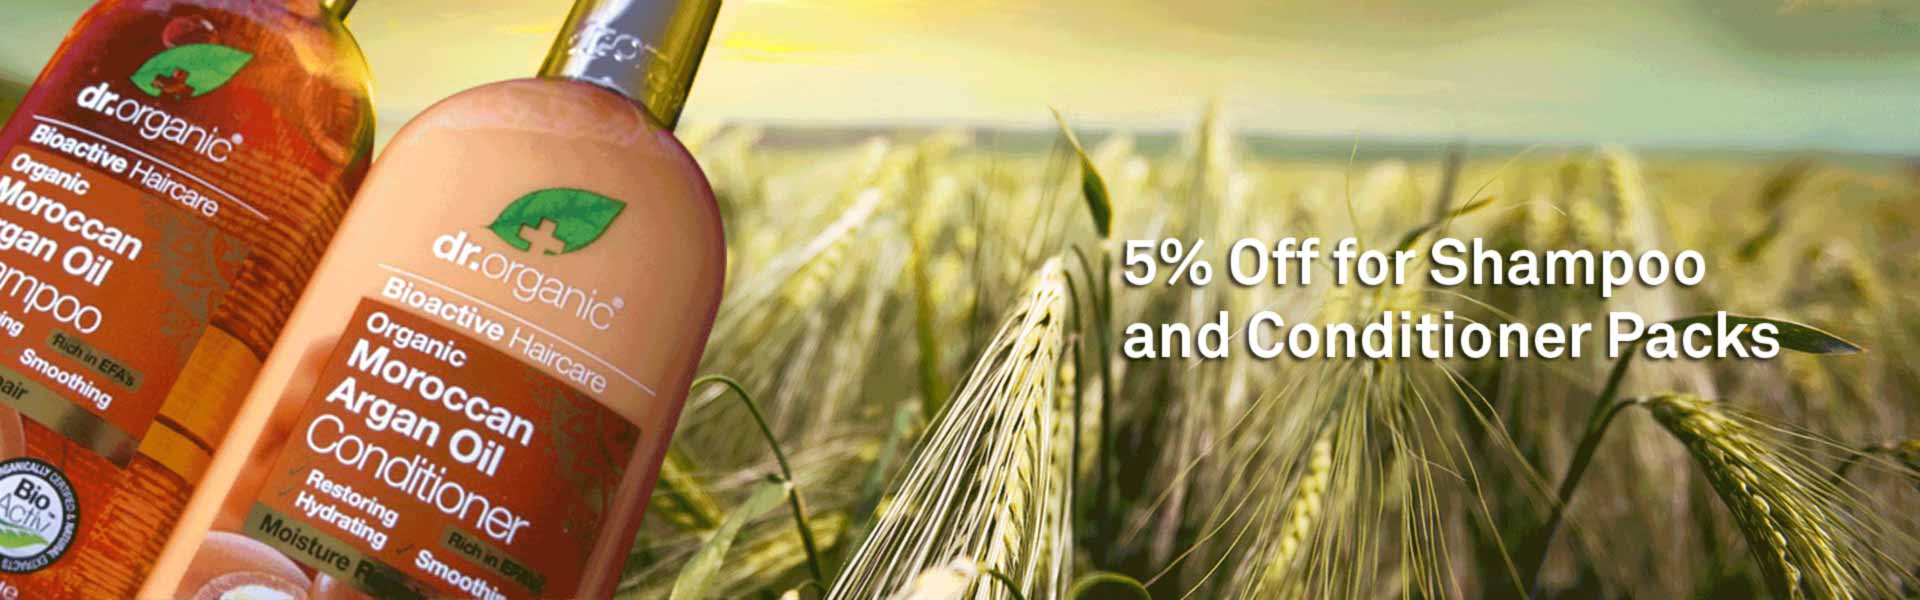 Dr Organics - 5% Off